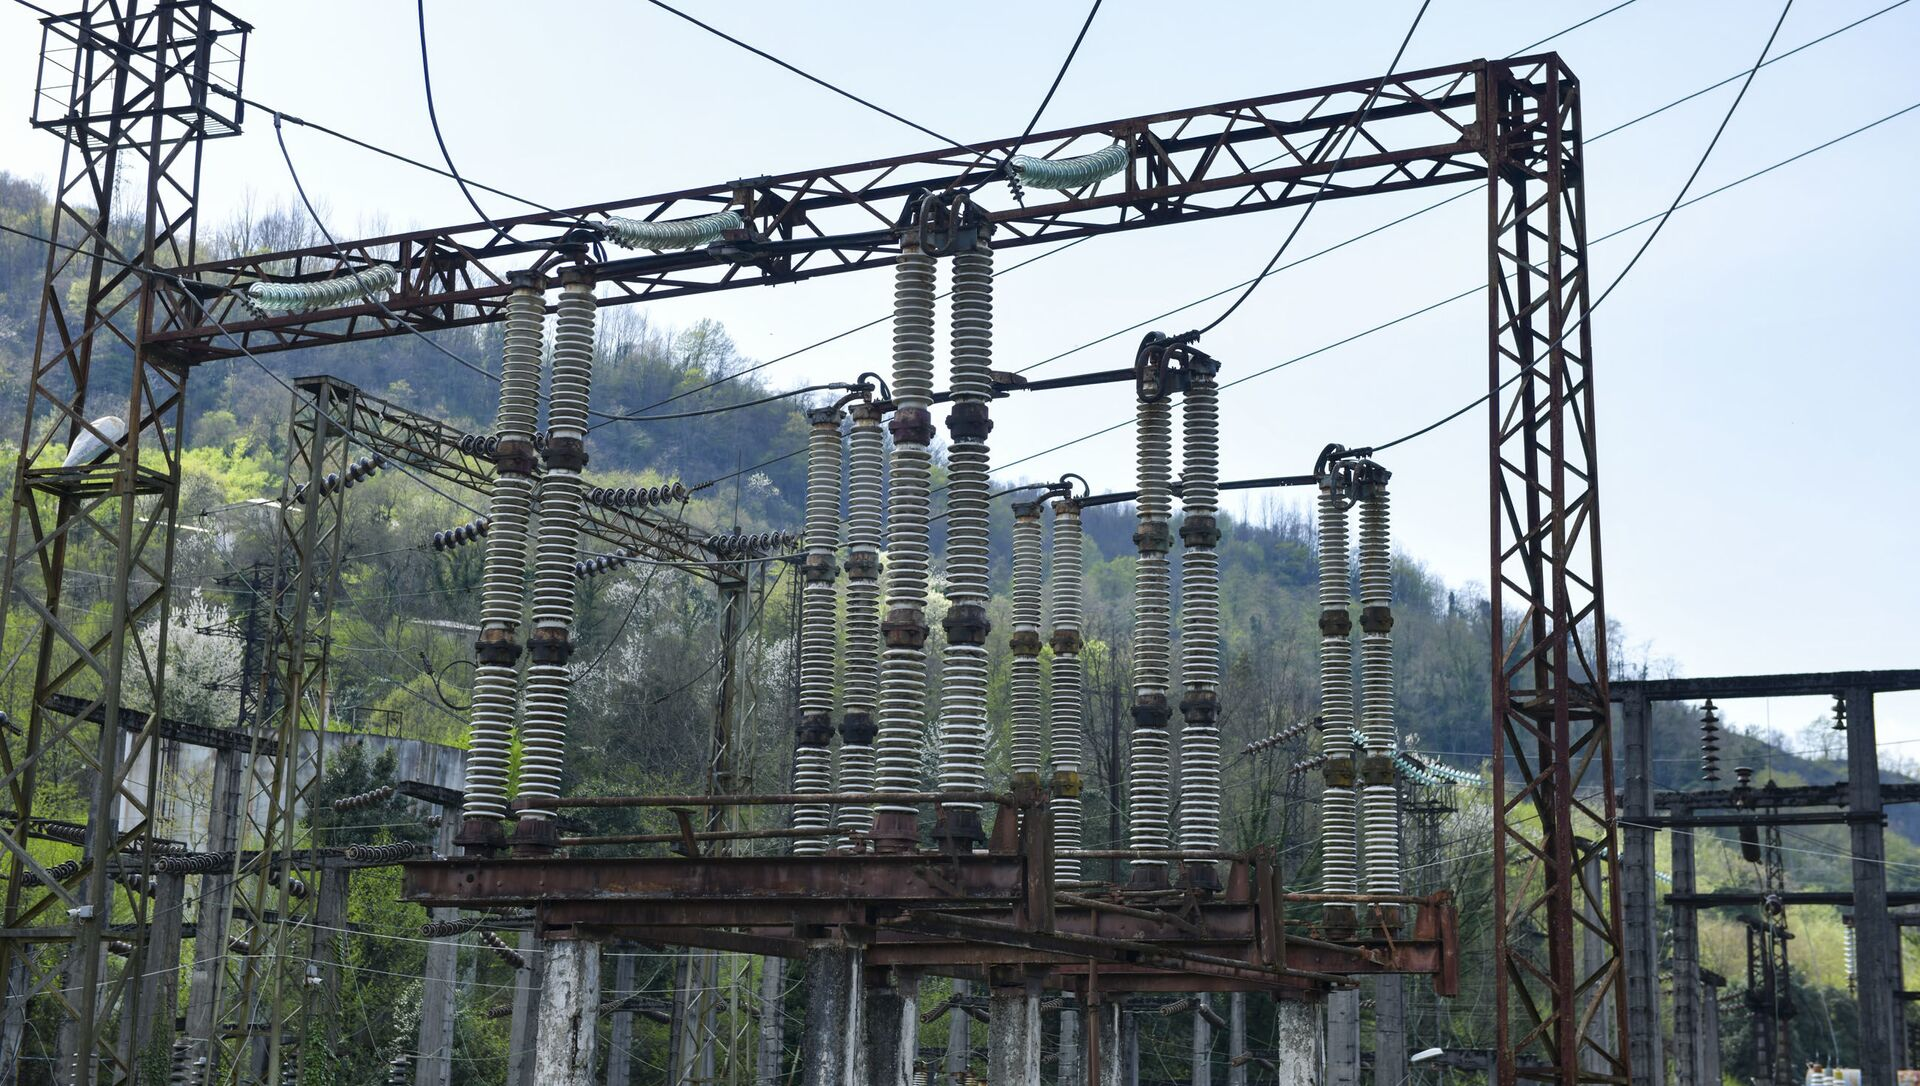 Электропровода  - Sputnik Абхазия, 1920, 29.08.2021